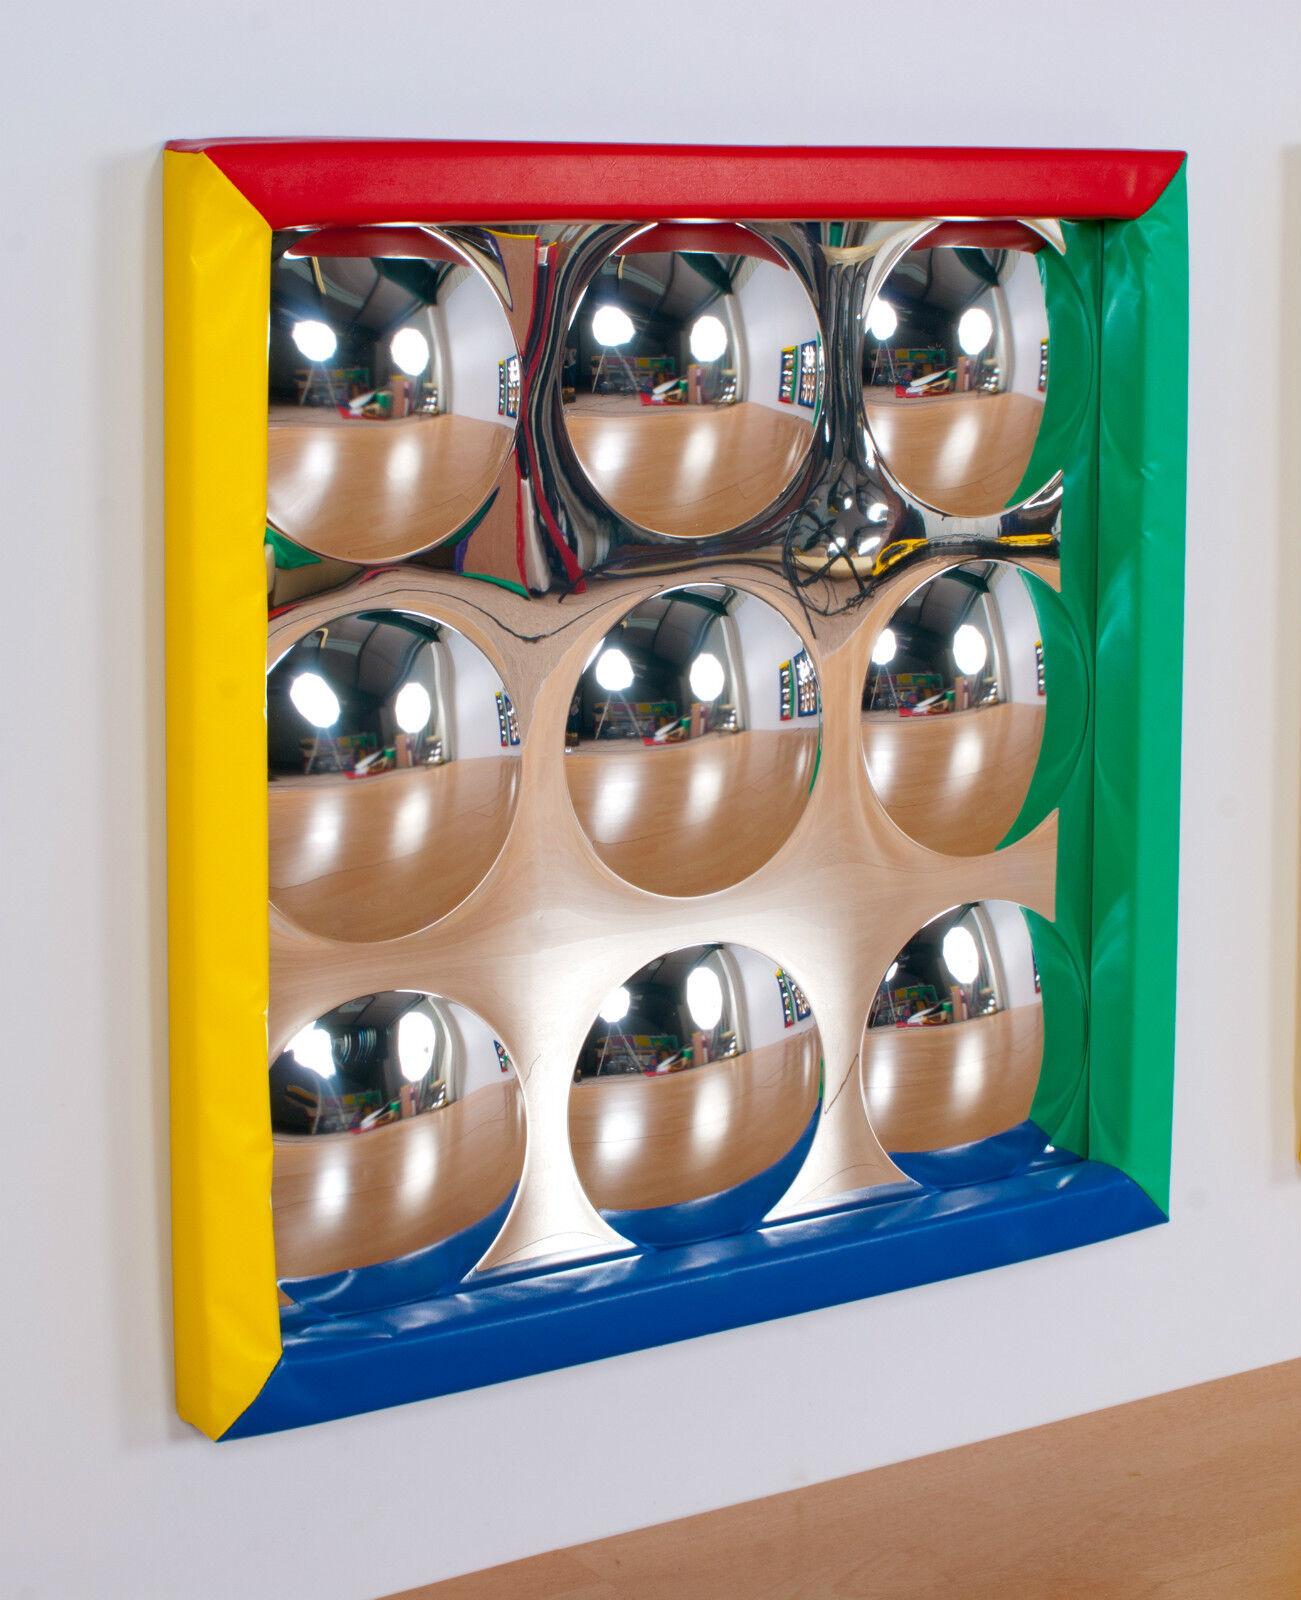 Sensory Safety Bubble Mirror Large Bubble Mirror (M3012)